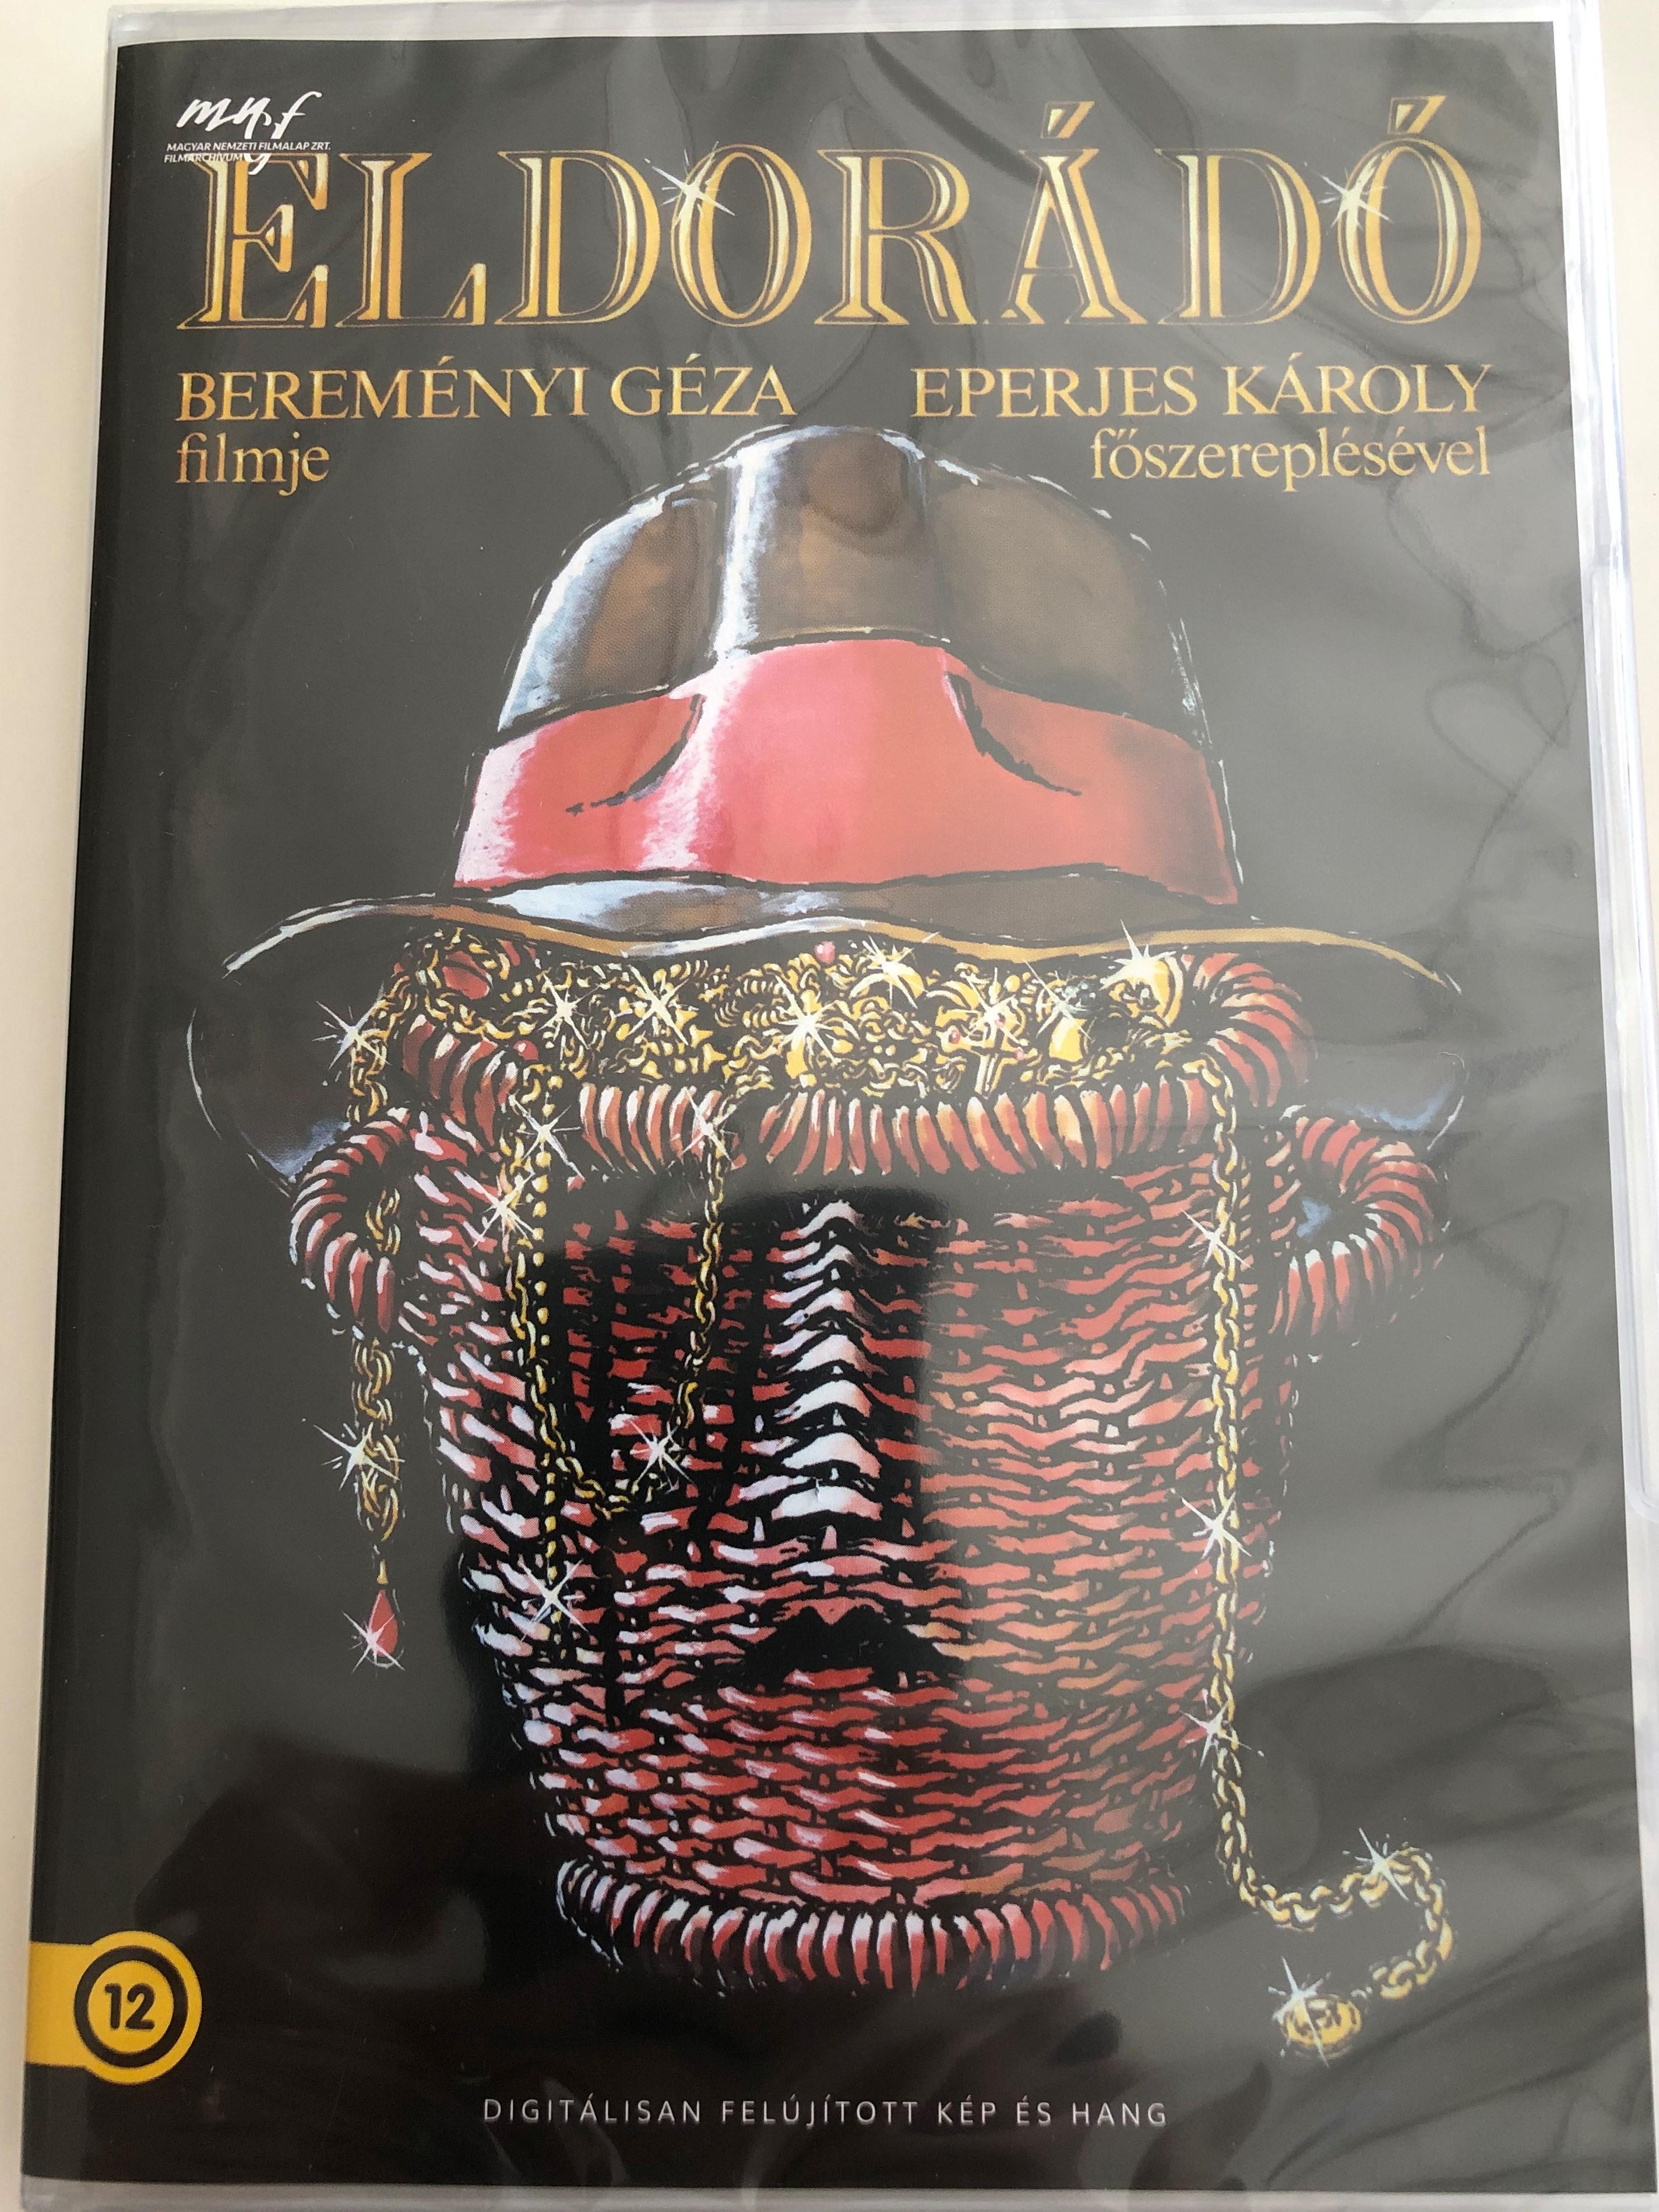 the-midas-touch-dvd-1988-eldor-d-directed-by-berem-nyi-g-za-starring-eperjes-k-roly-pog-ny-judit-t-th-barnab-s-eszenyi-enik-1-.jpg